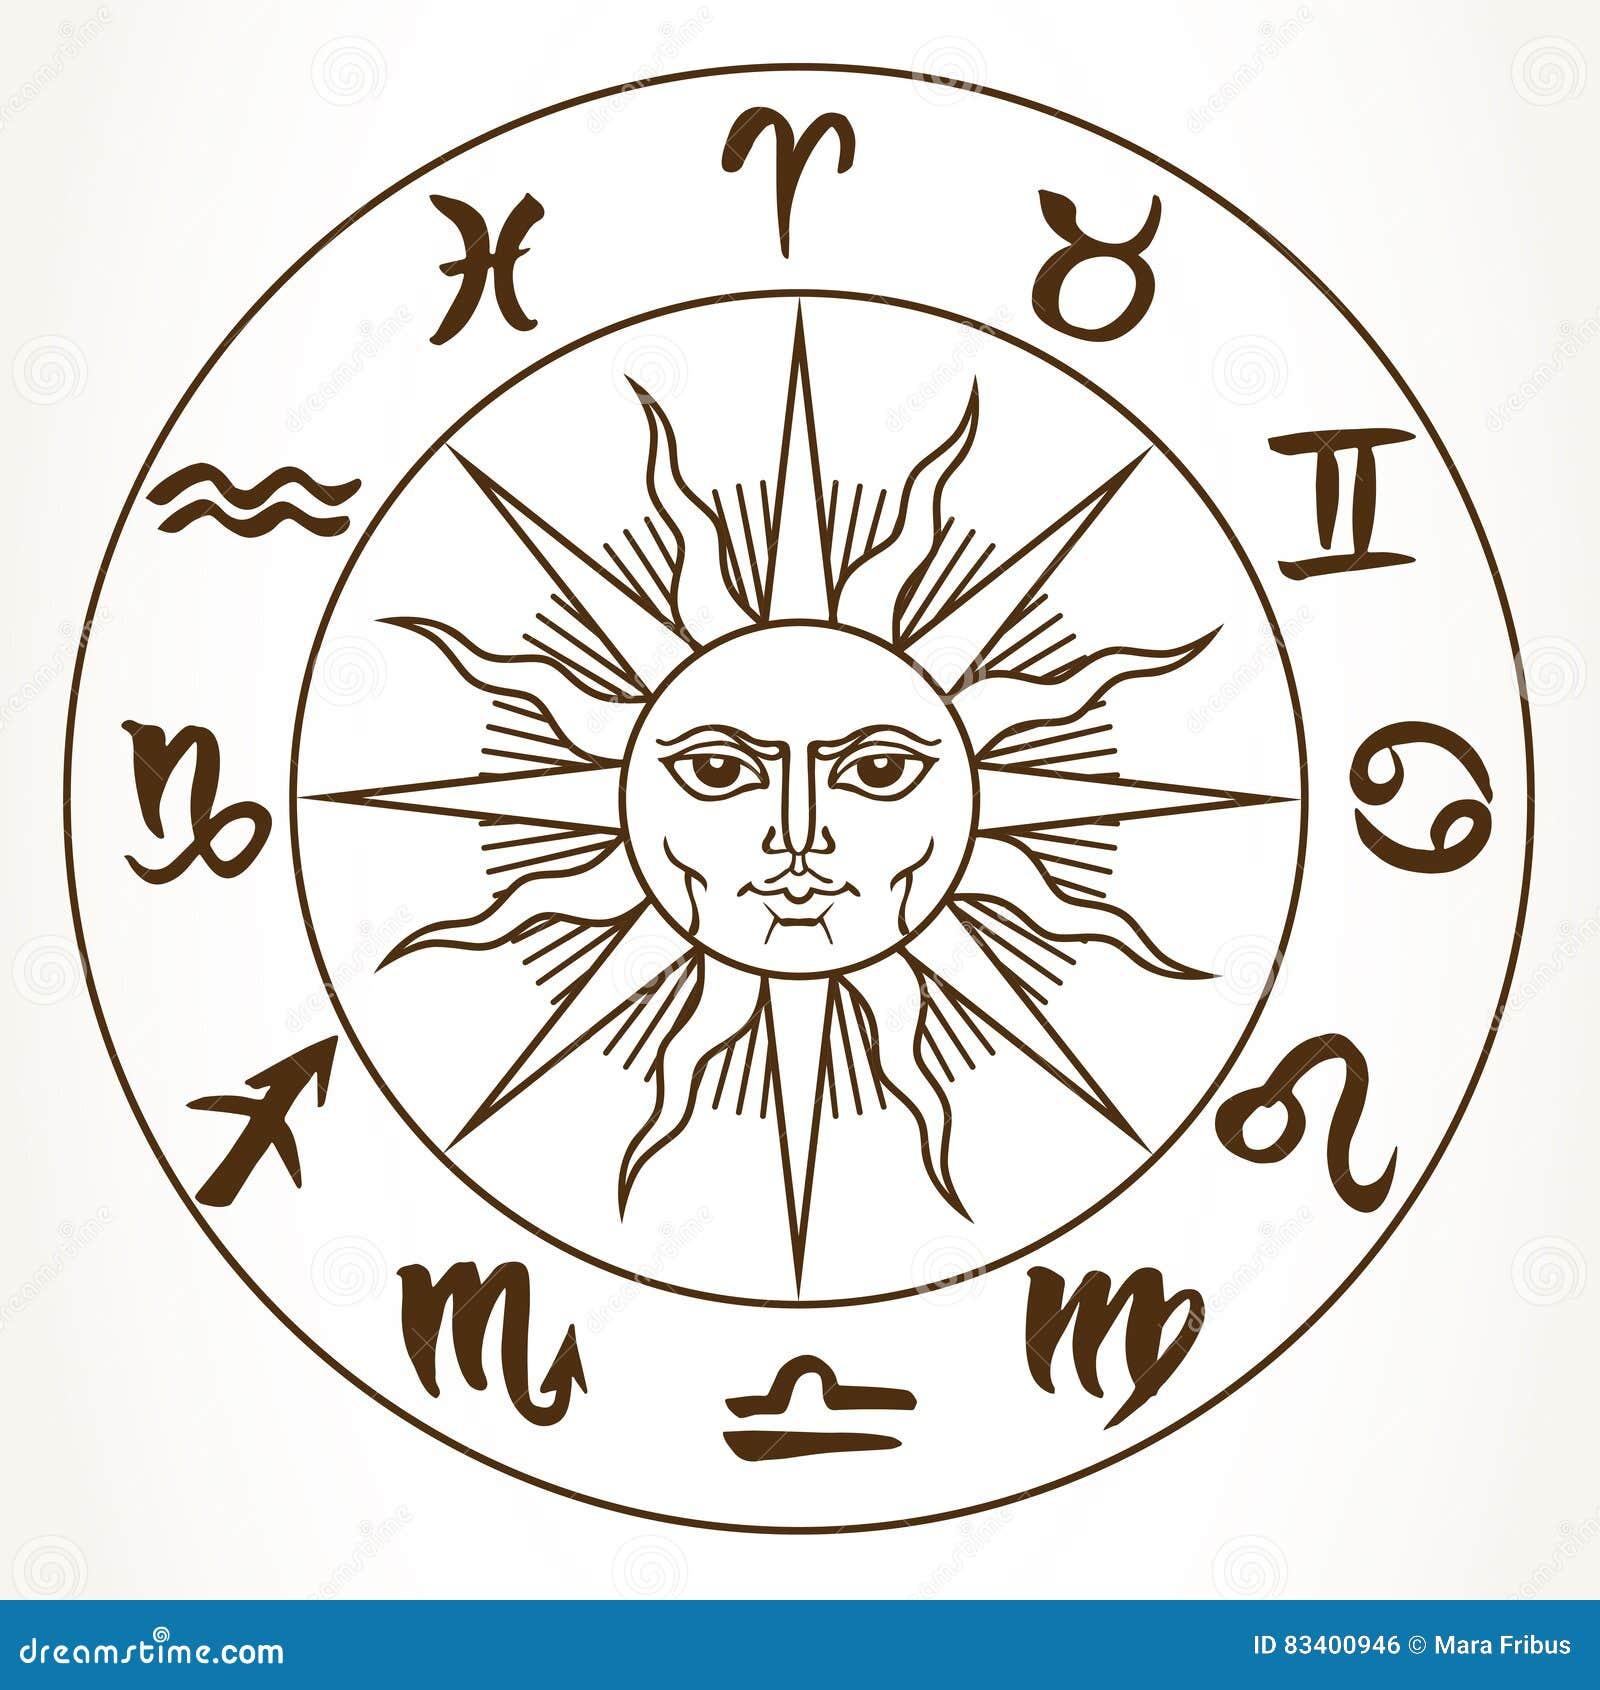 знаки зодиака картинки контурные карты